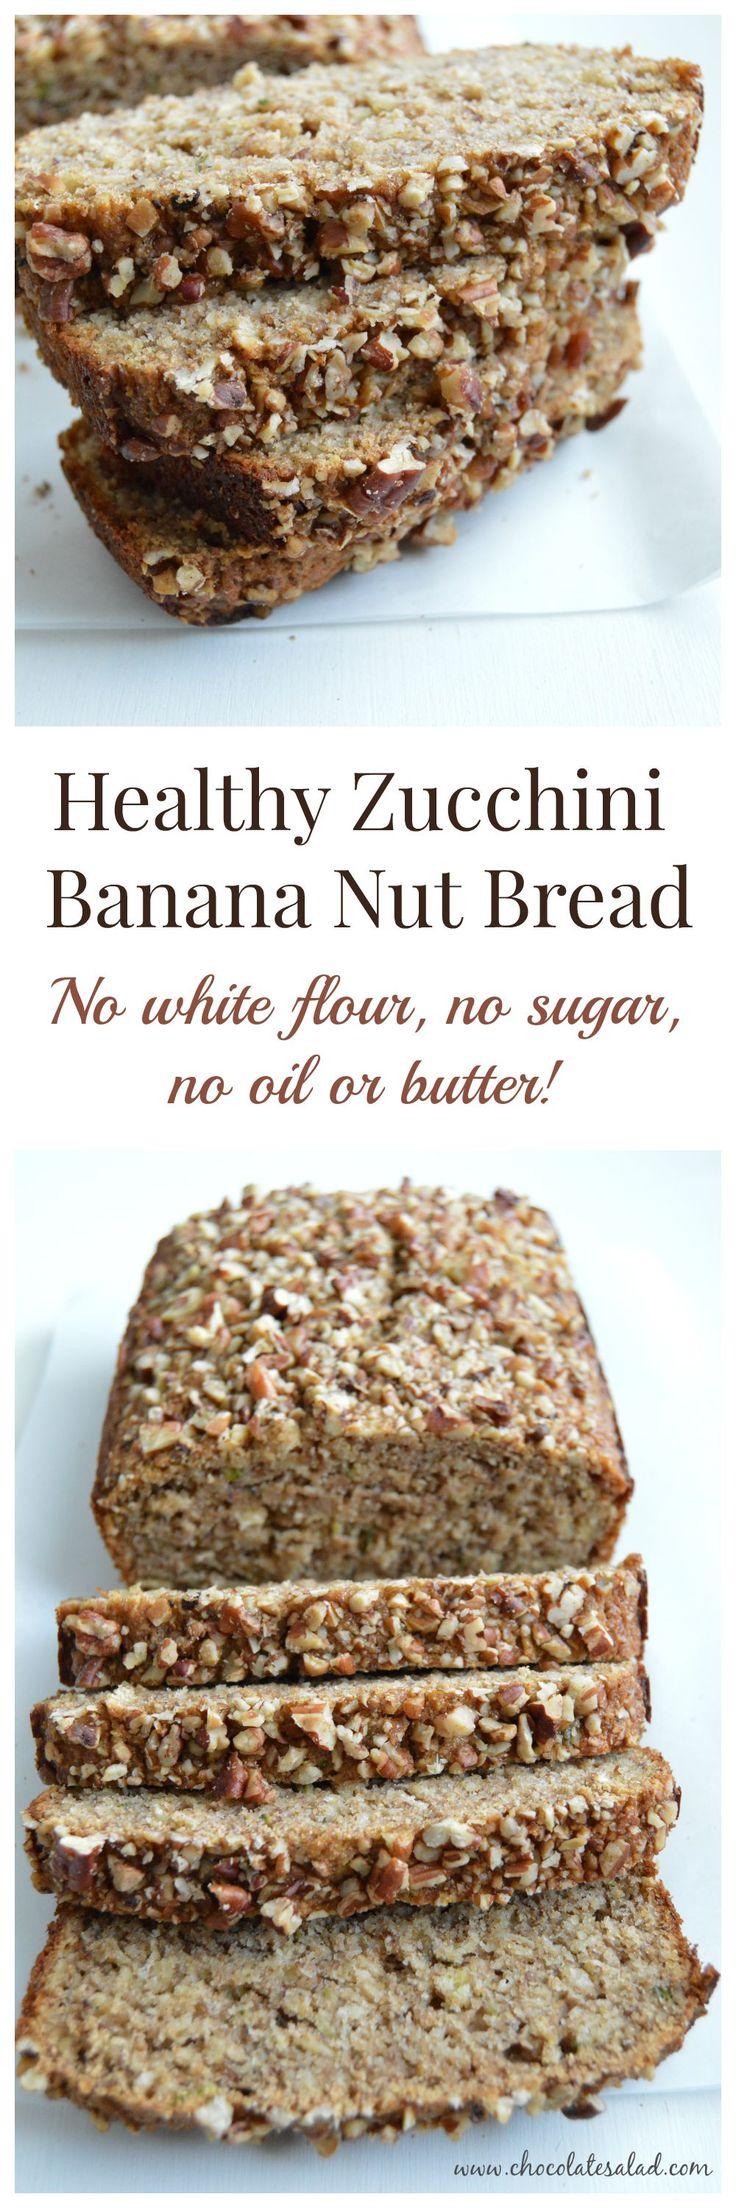 Under 100 calories per slice! Healthy Zucchini Banana Nut Bread on chocolatesalad.com